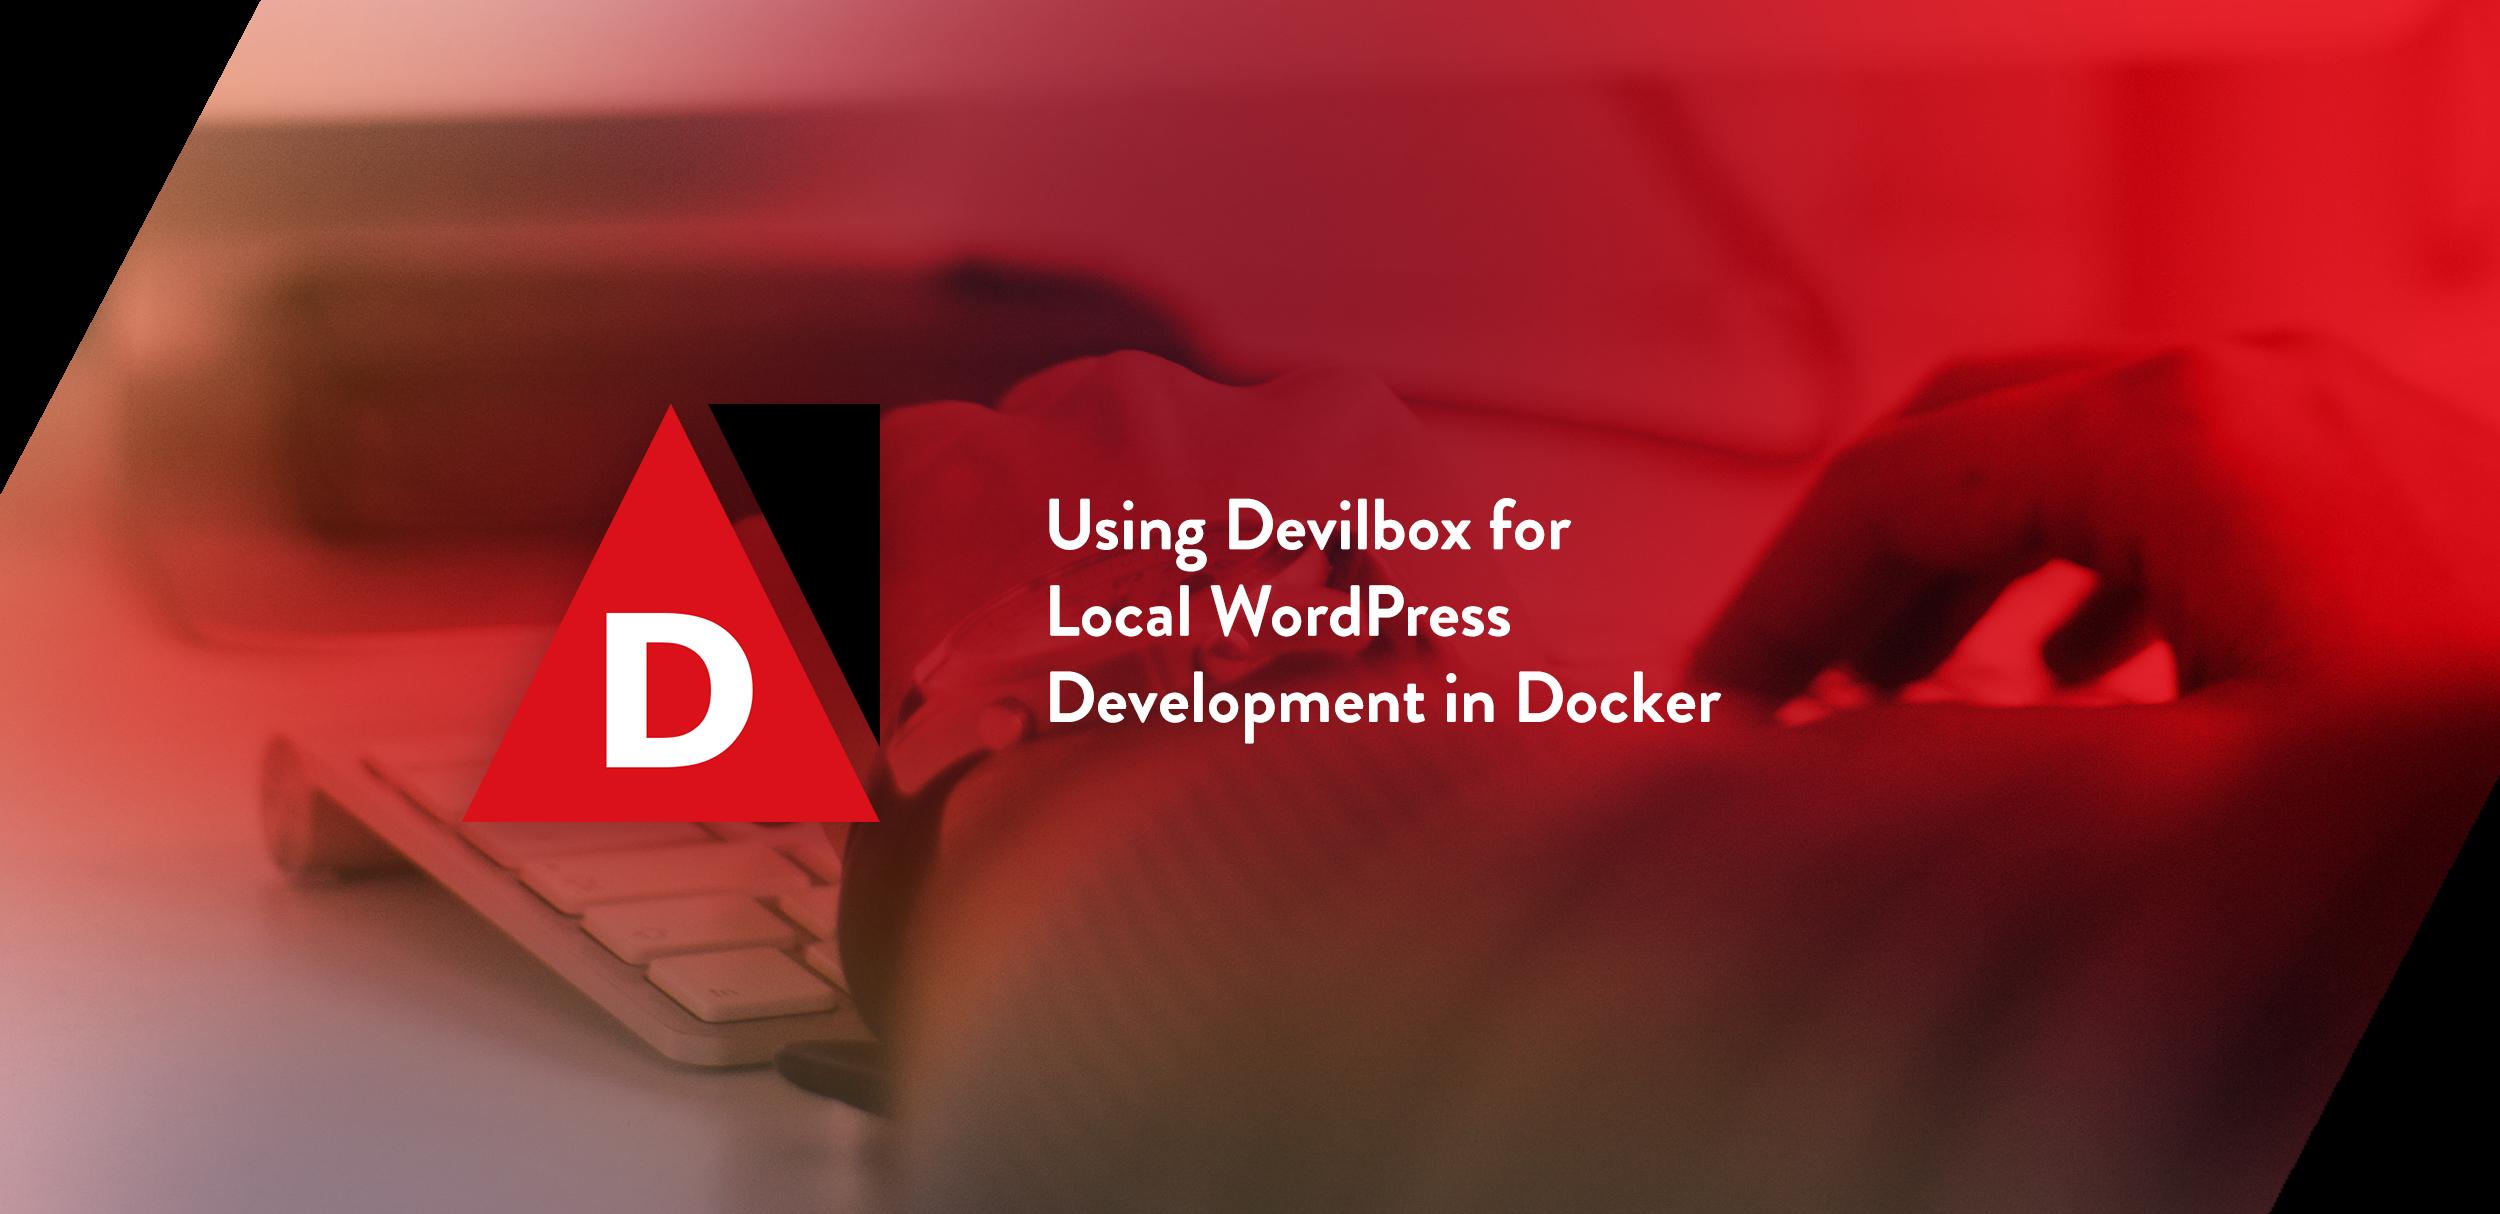 Using Devilbox for Local WordPress Development in Docker